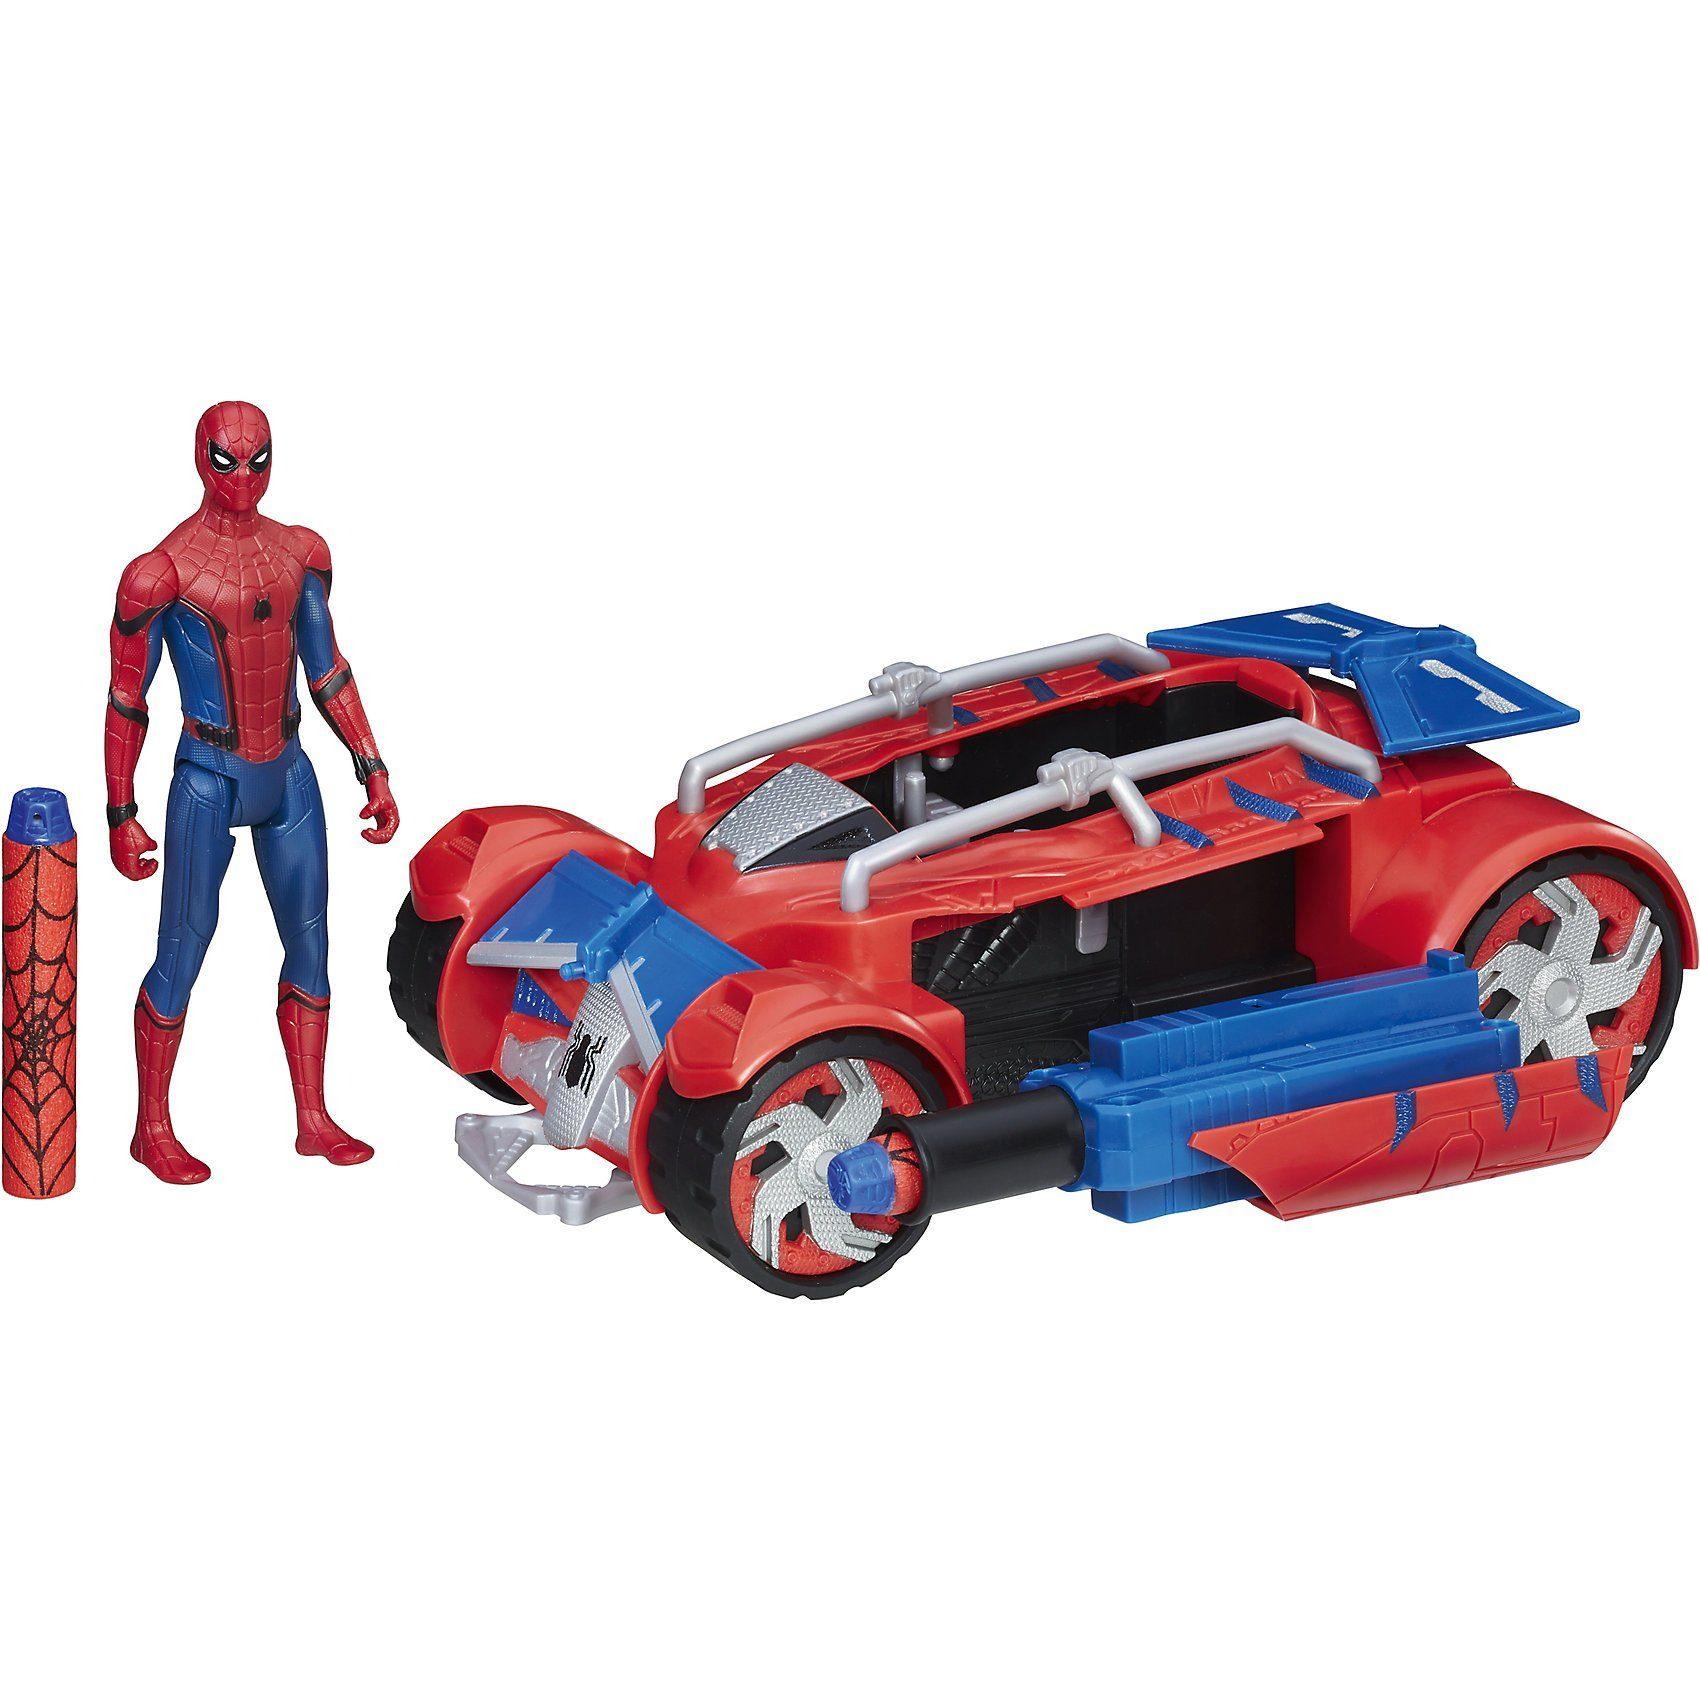 Hasbro Spider-Man Web City Hero Racer